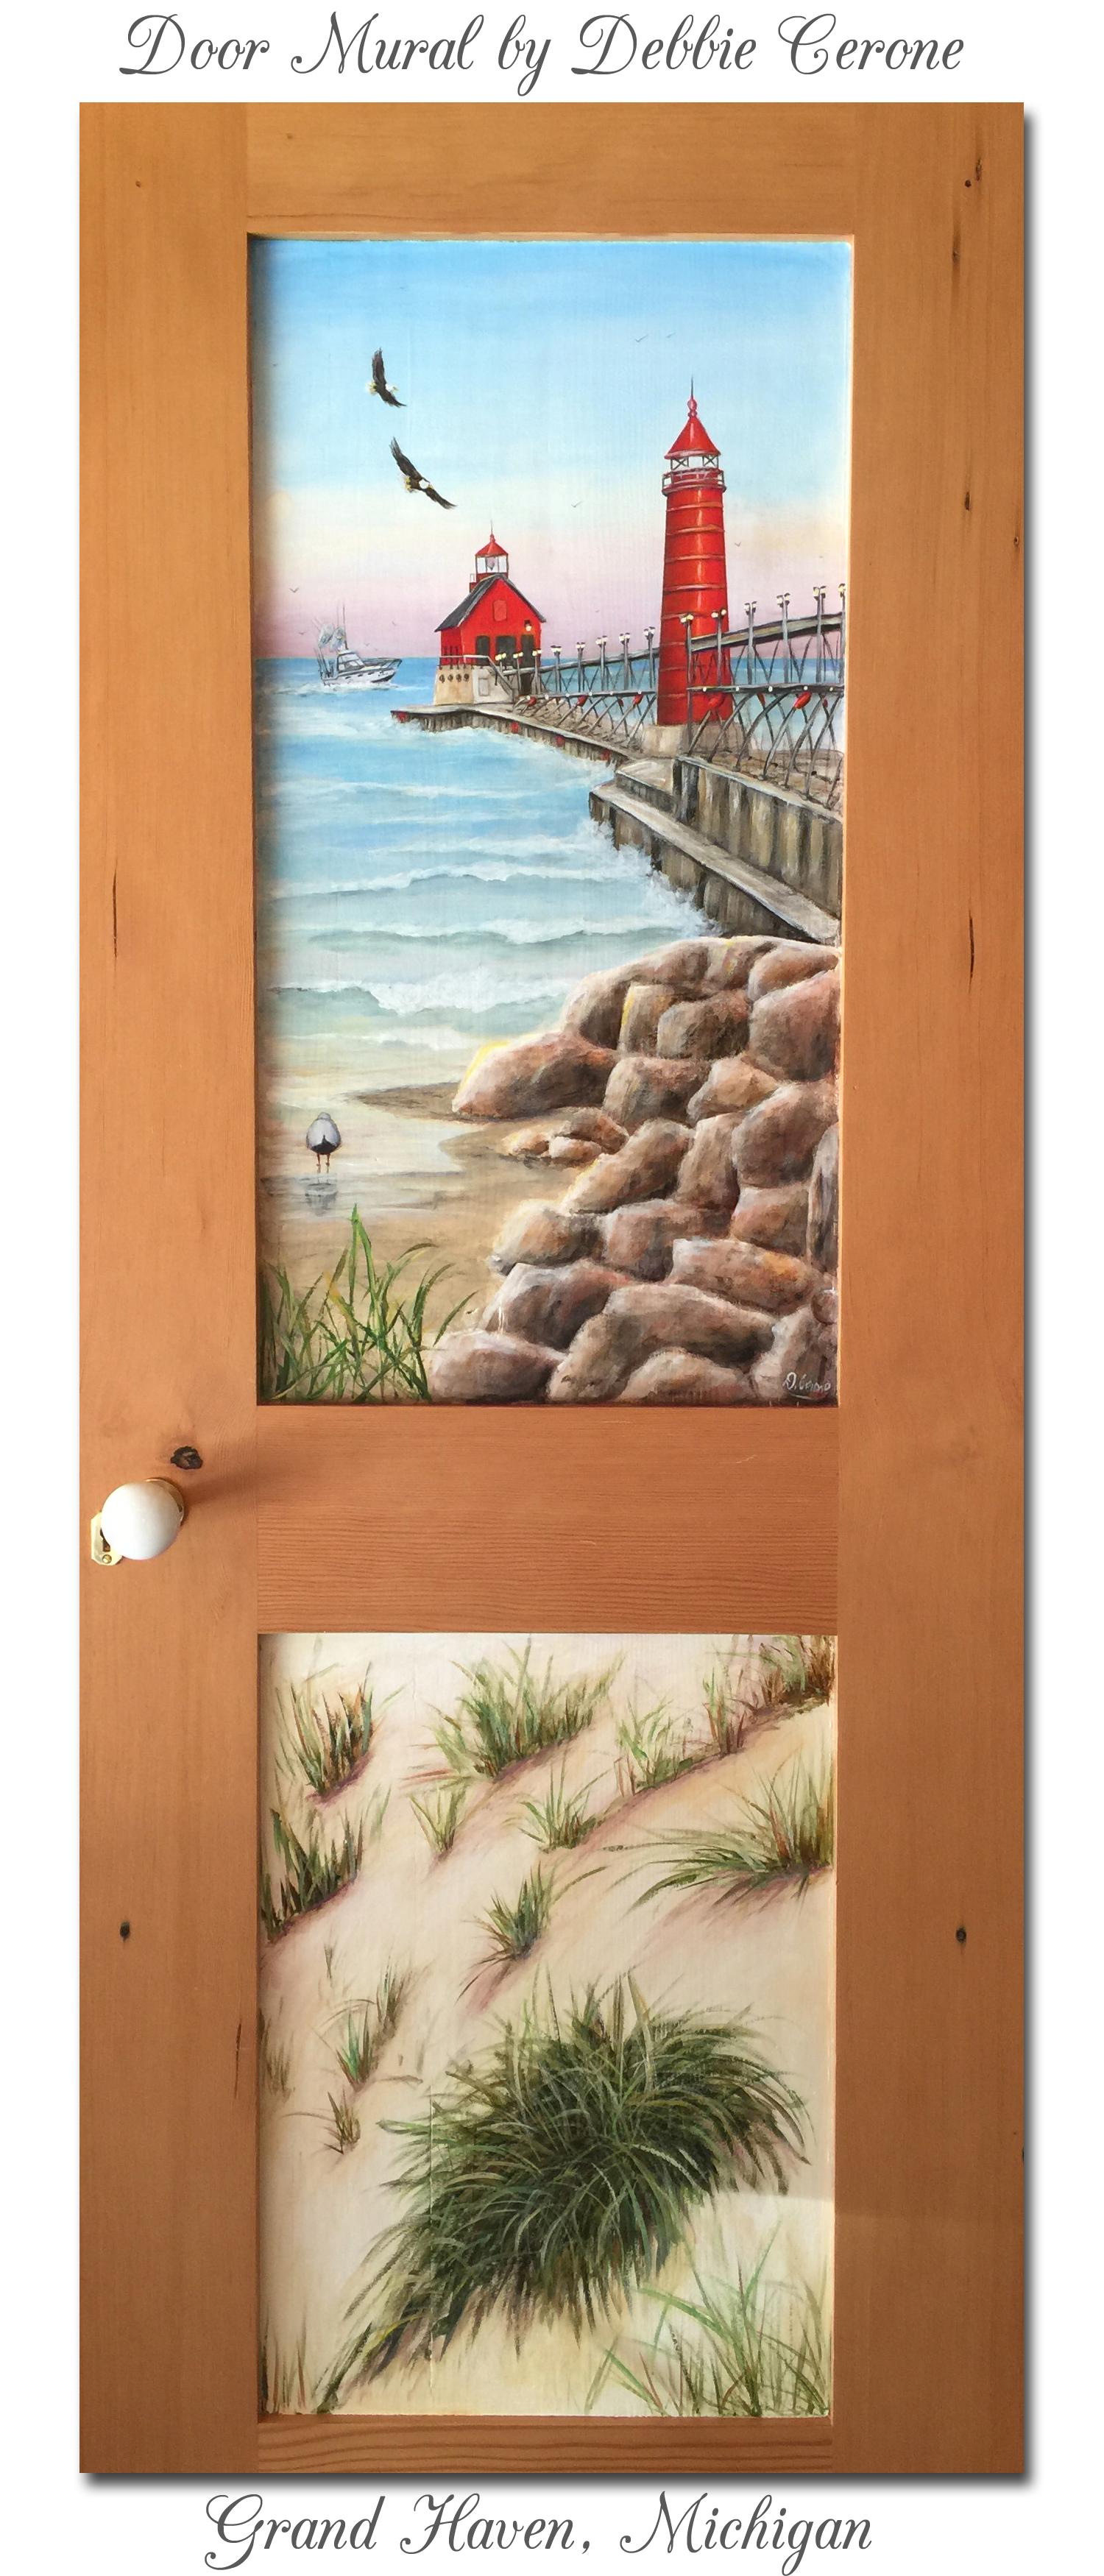 art ideas by debbie cerone restaurant commercial murals grand haven michigan lighthouse full door mural title